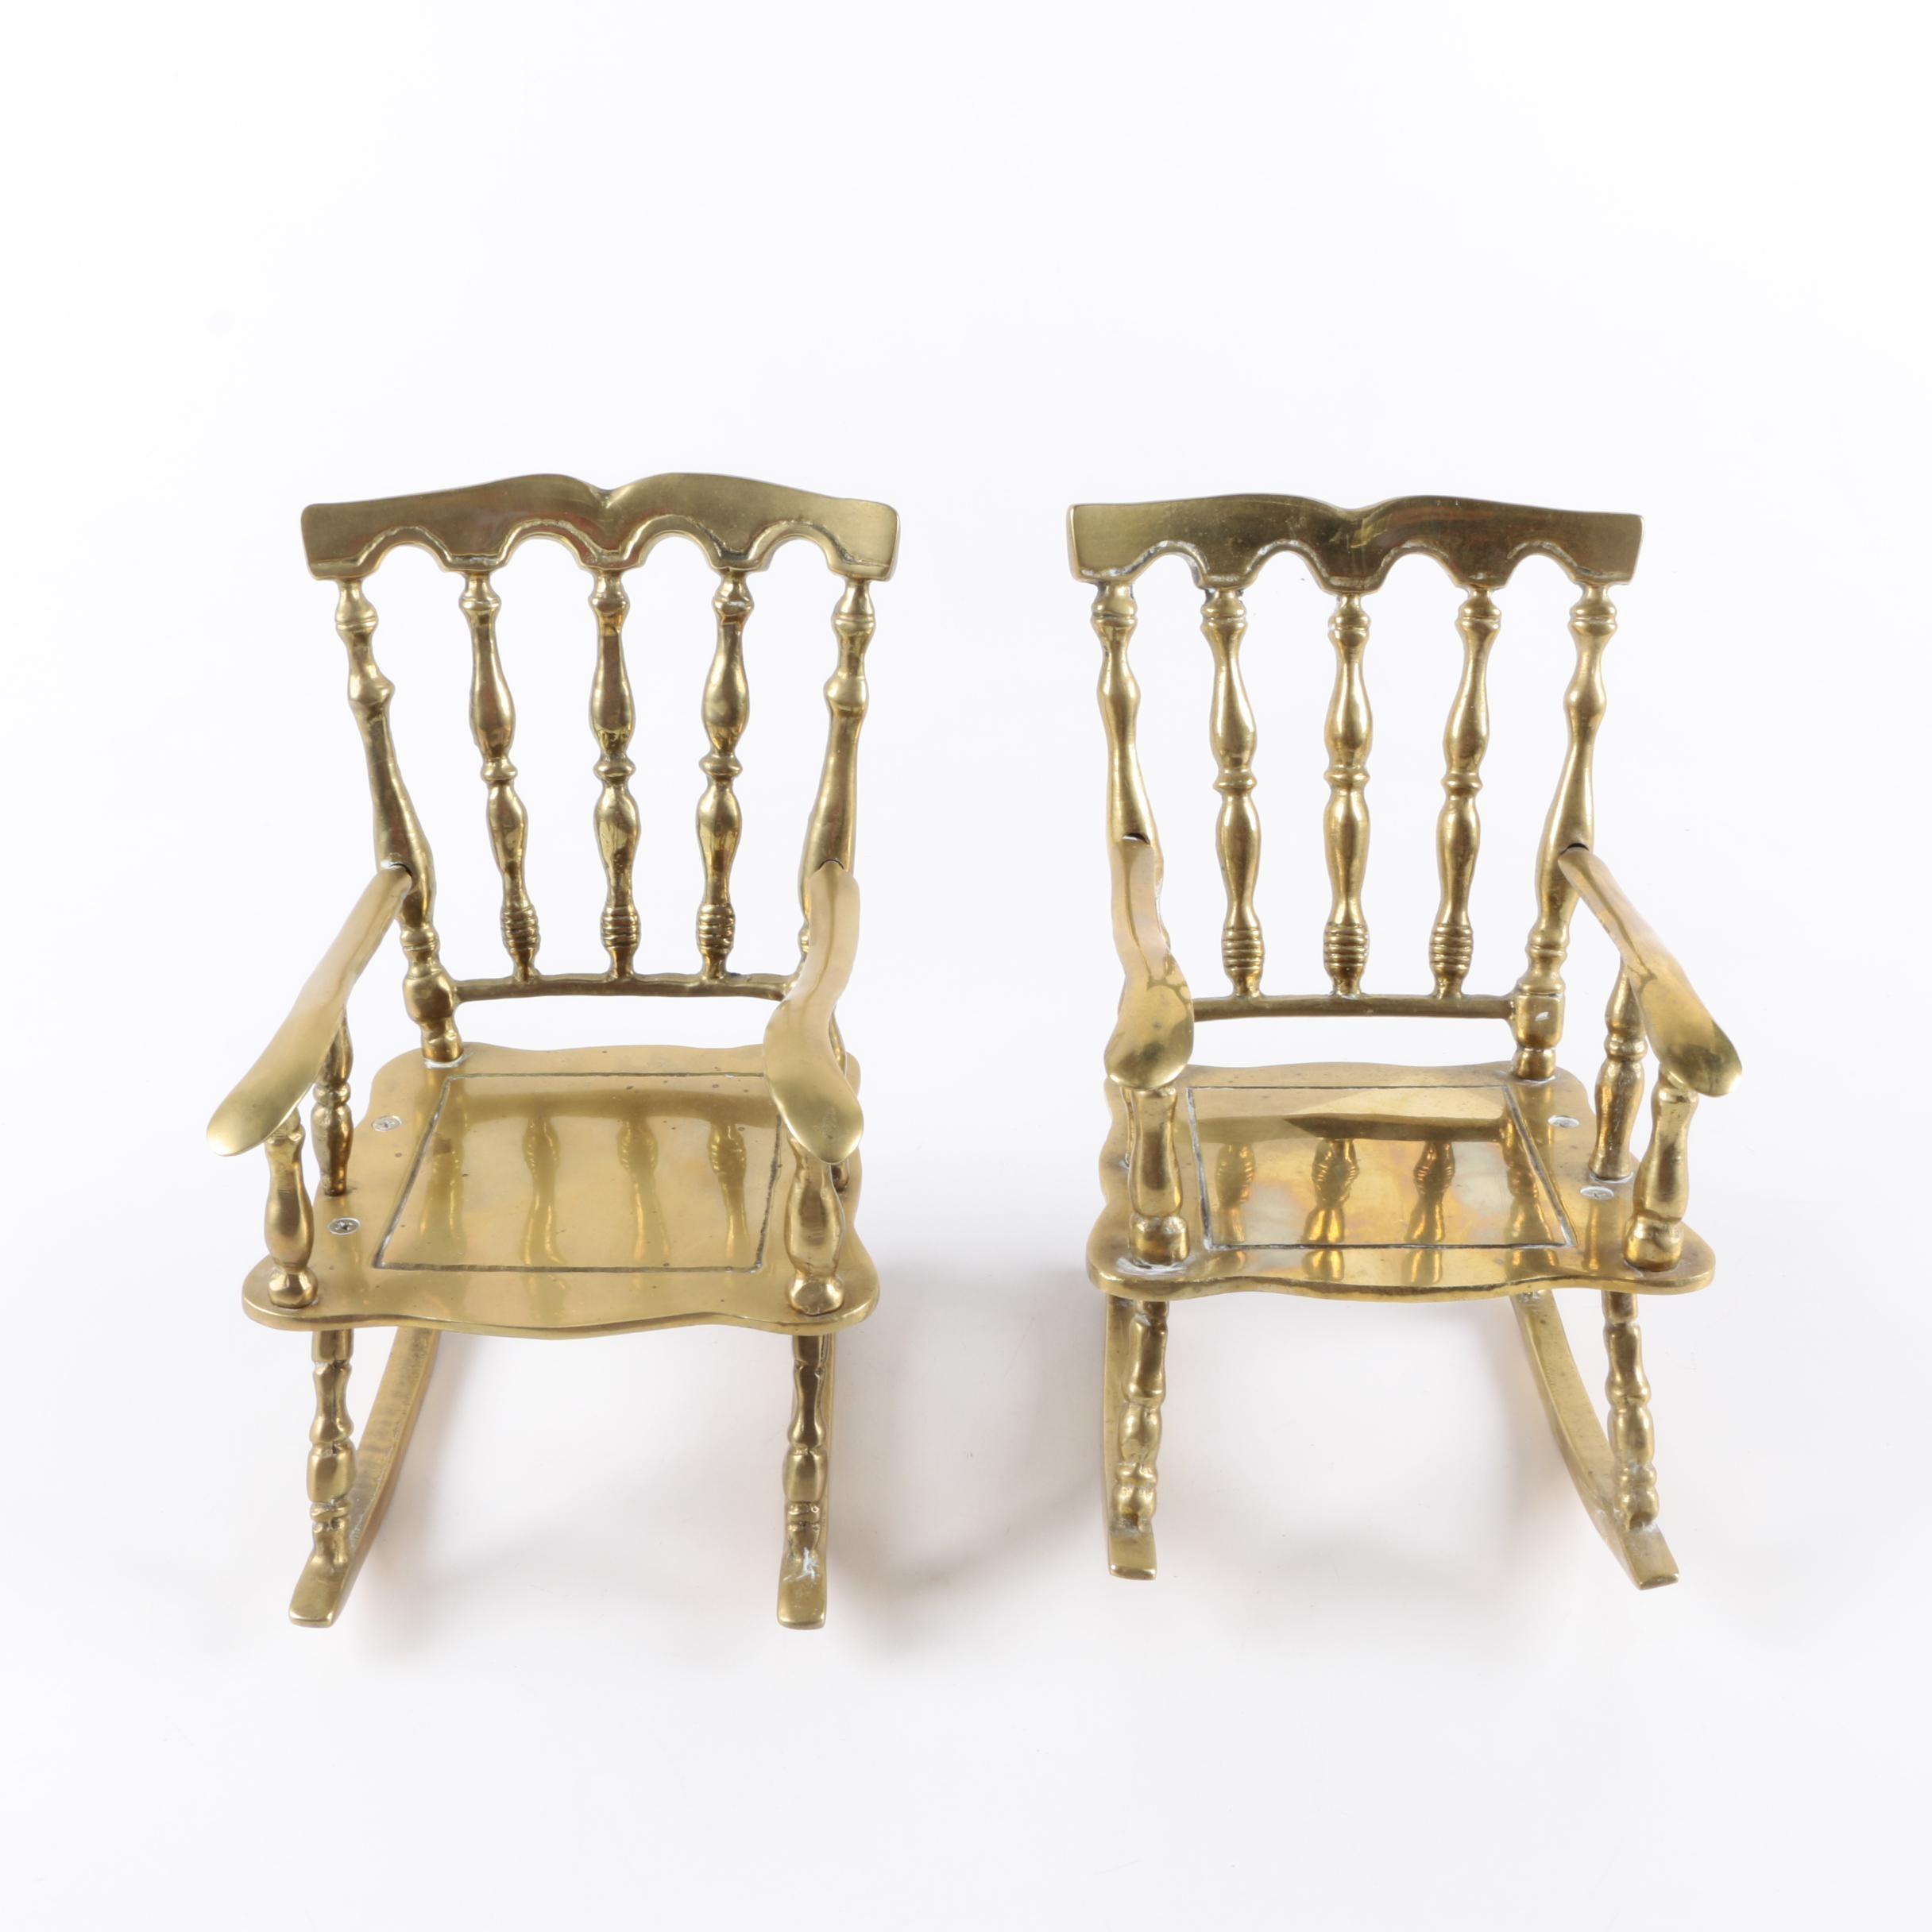 Miniature Brass Rocking Chairs